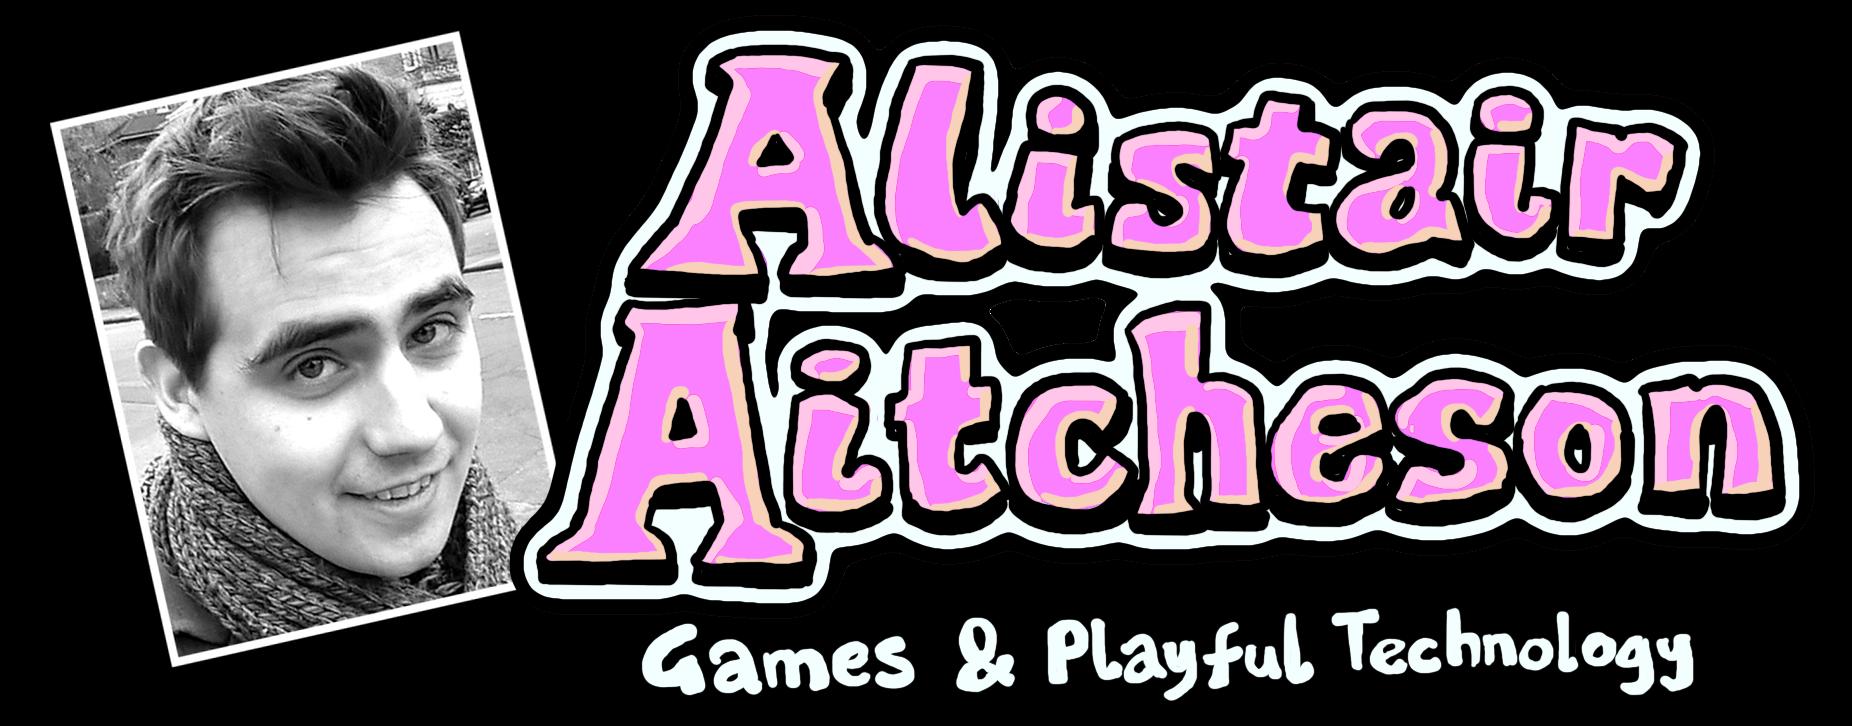 Alistair Aitcheson